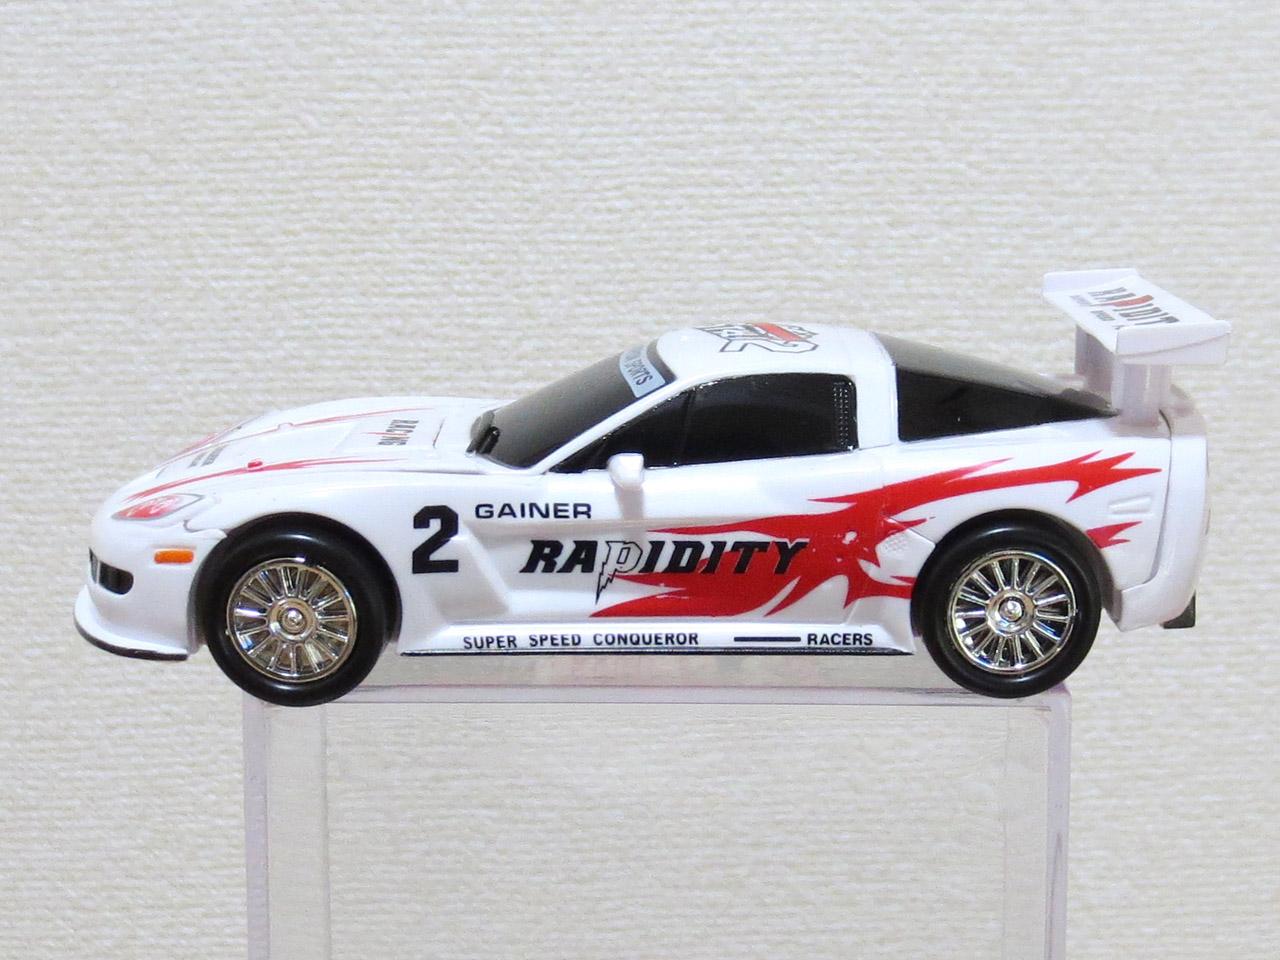 Change_Car_Robot_Doujin_23.jpg